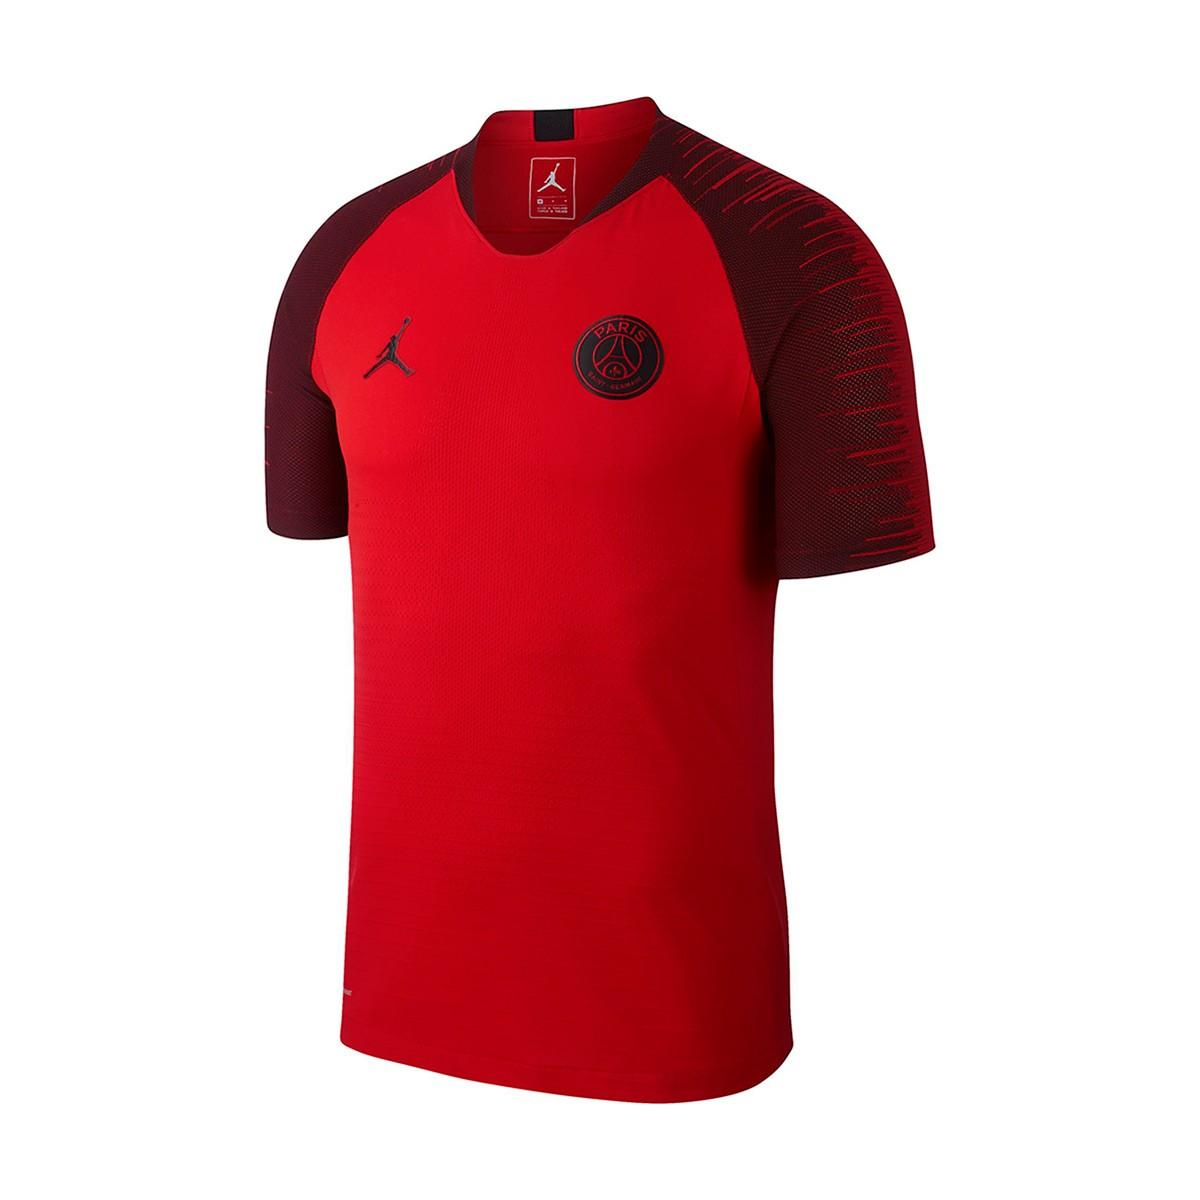 487f5be722579 Camiseta Nike Paris Saint-Germain VaporKnit Strike SS CL 2018-2019  University red-Black - Tienda de fútbol Fútbol Emotion